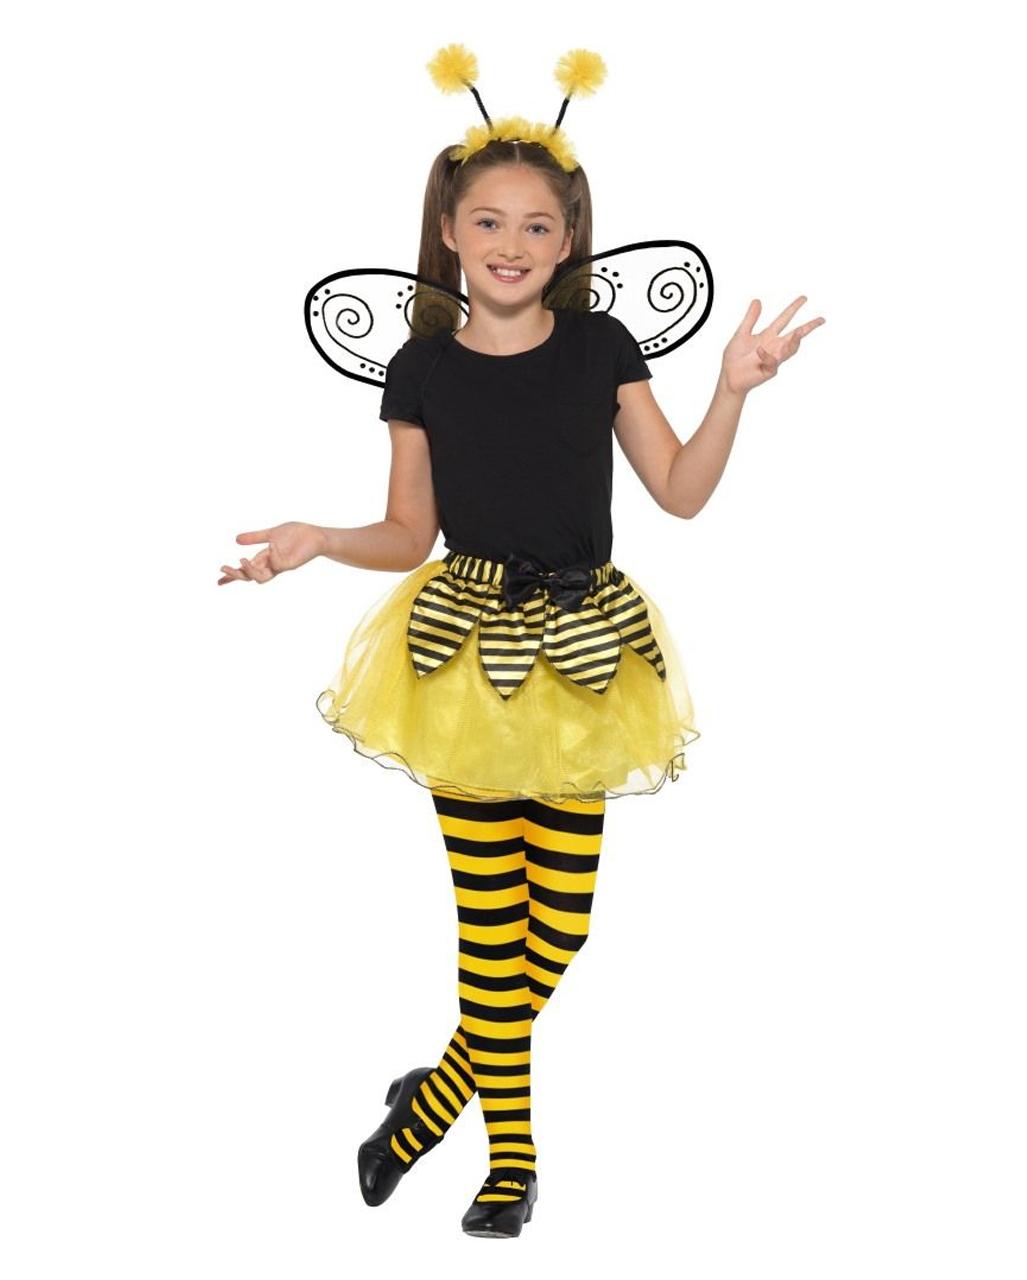 Bienen Kostumzubehor Set Fur Kinder Fur Fasching Karneval Universe